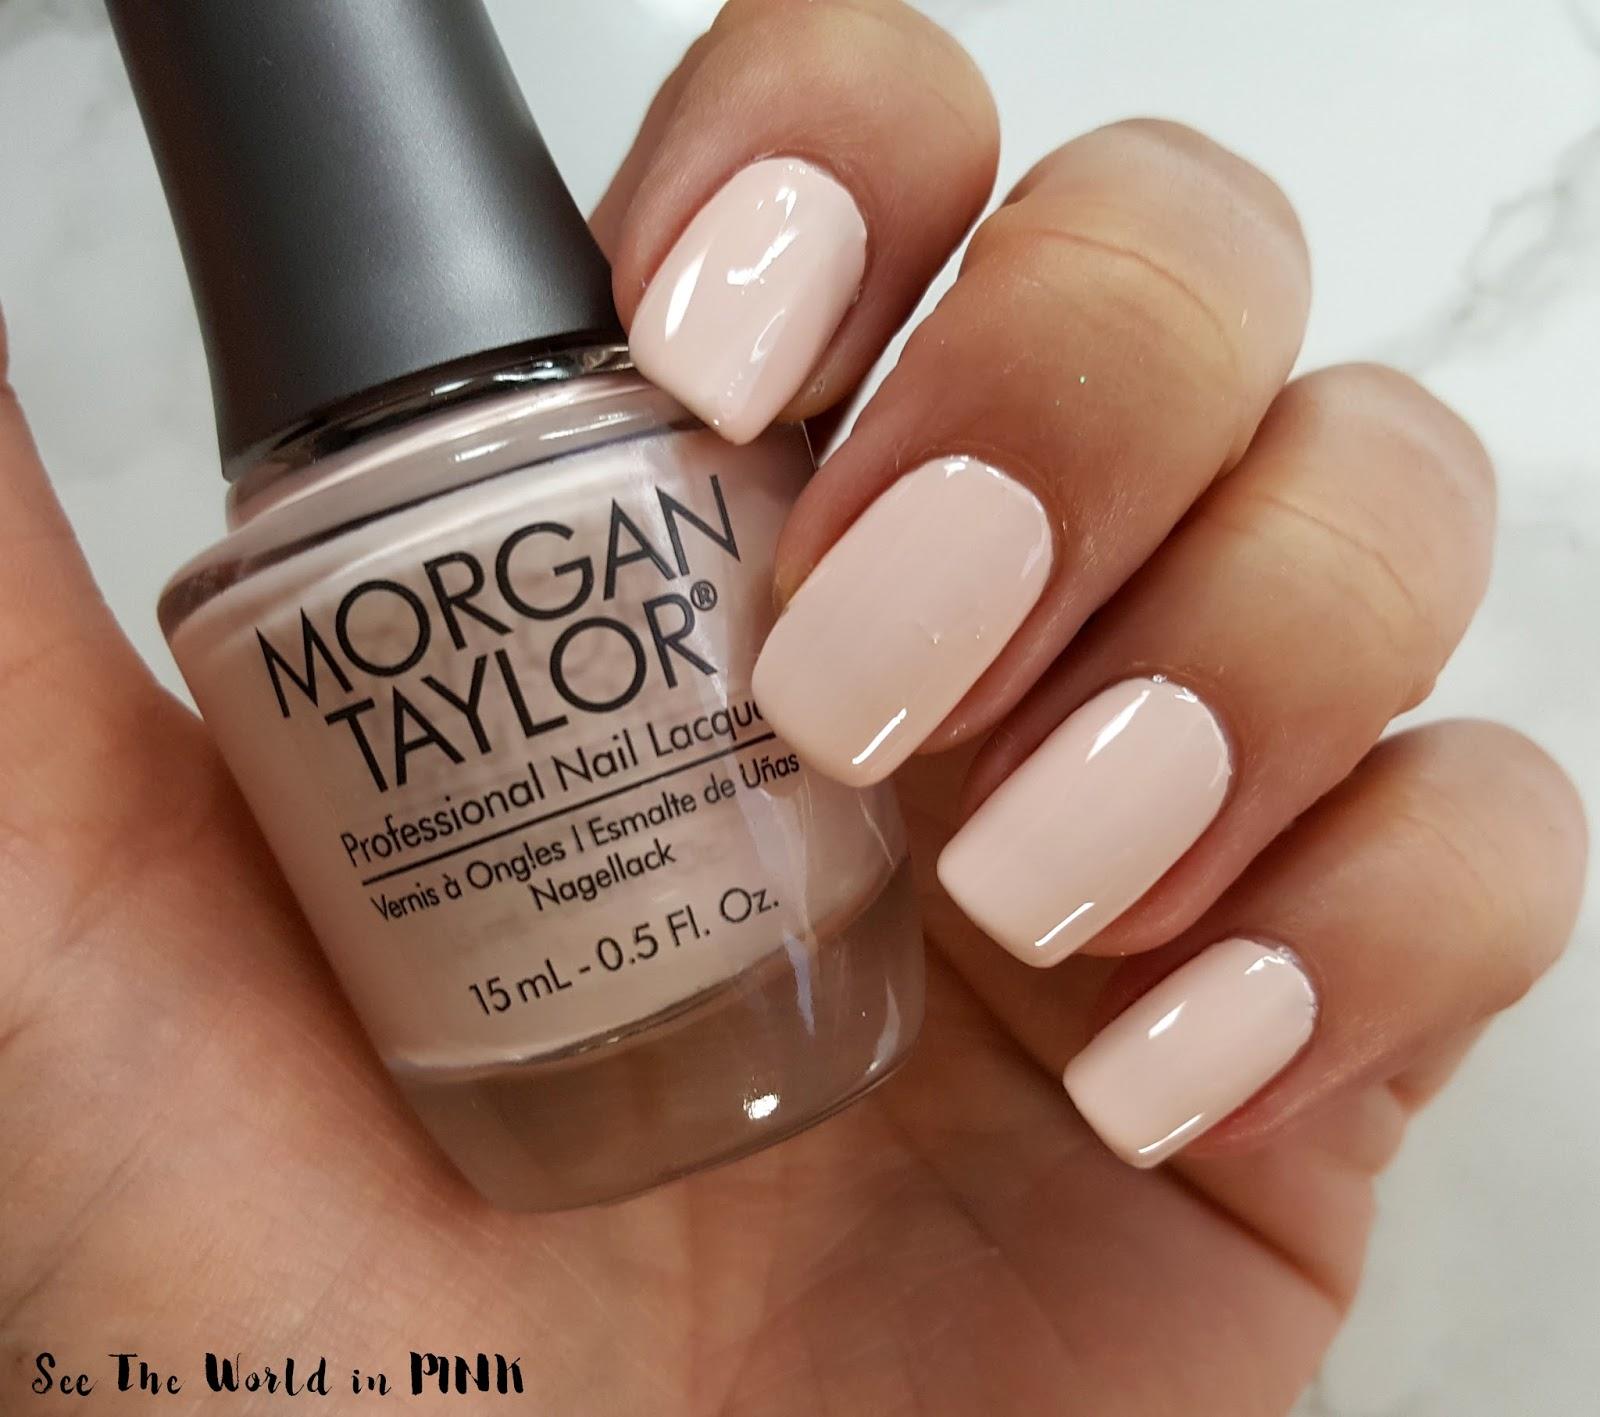 Morgan Taylor Royal Temptations collection Curls & Pearls